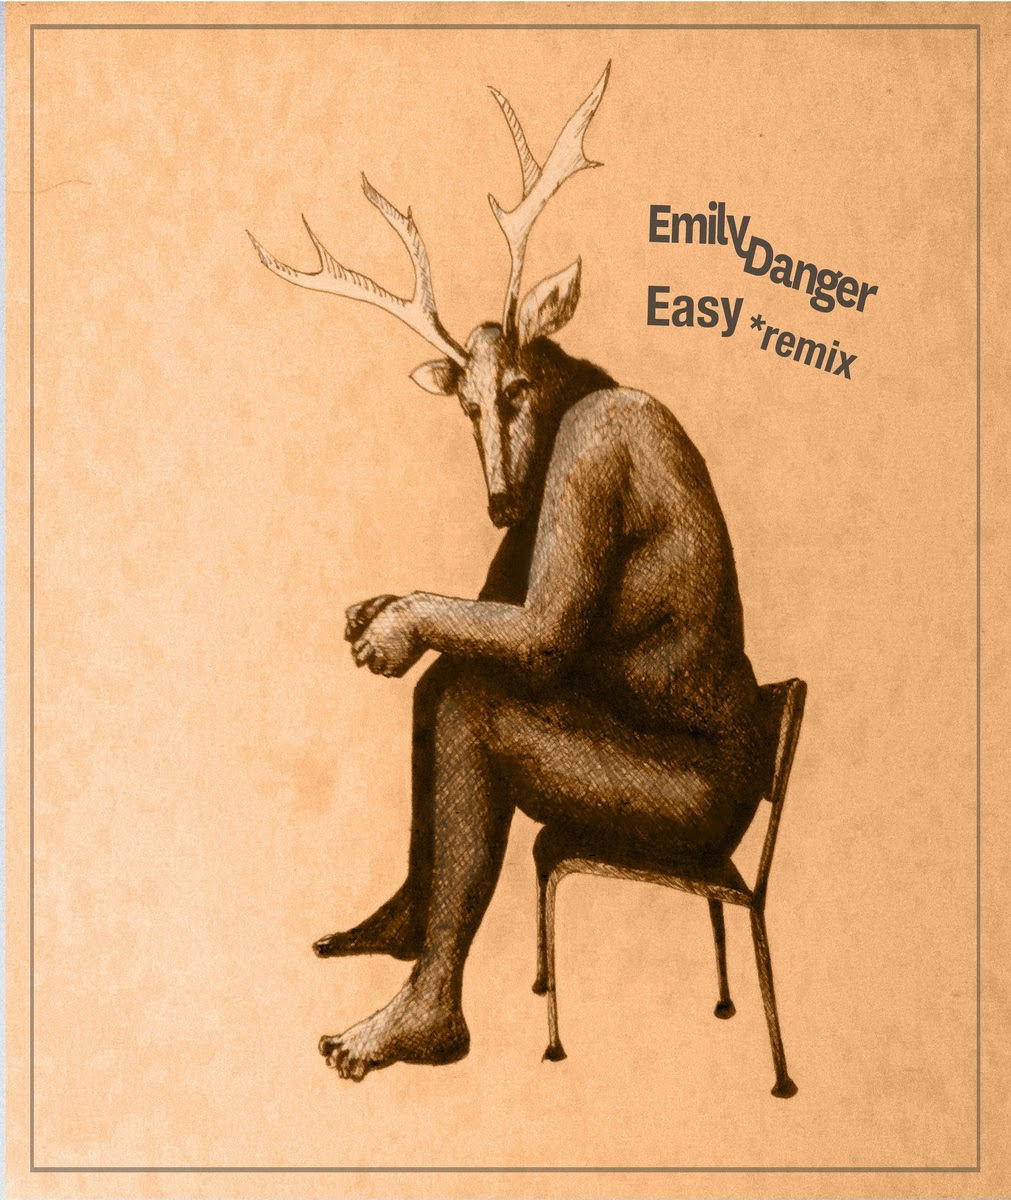 www.d4am.net//2014/04/emily-danger-easy-remix.html